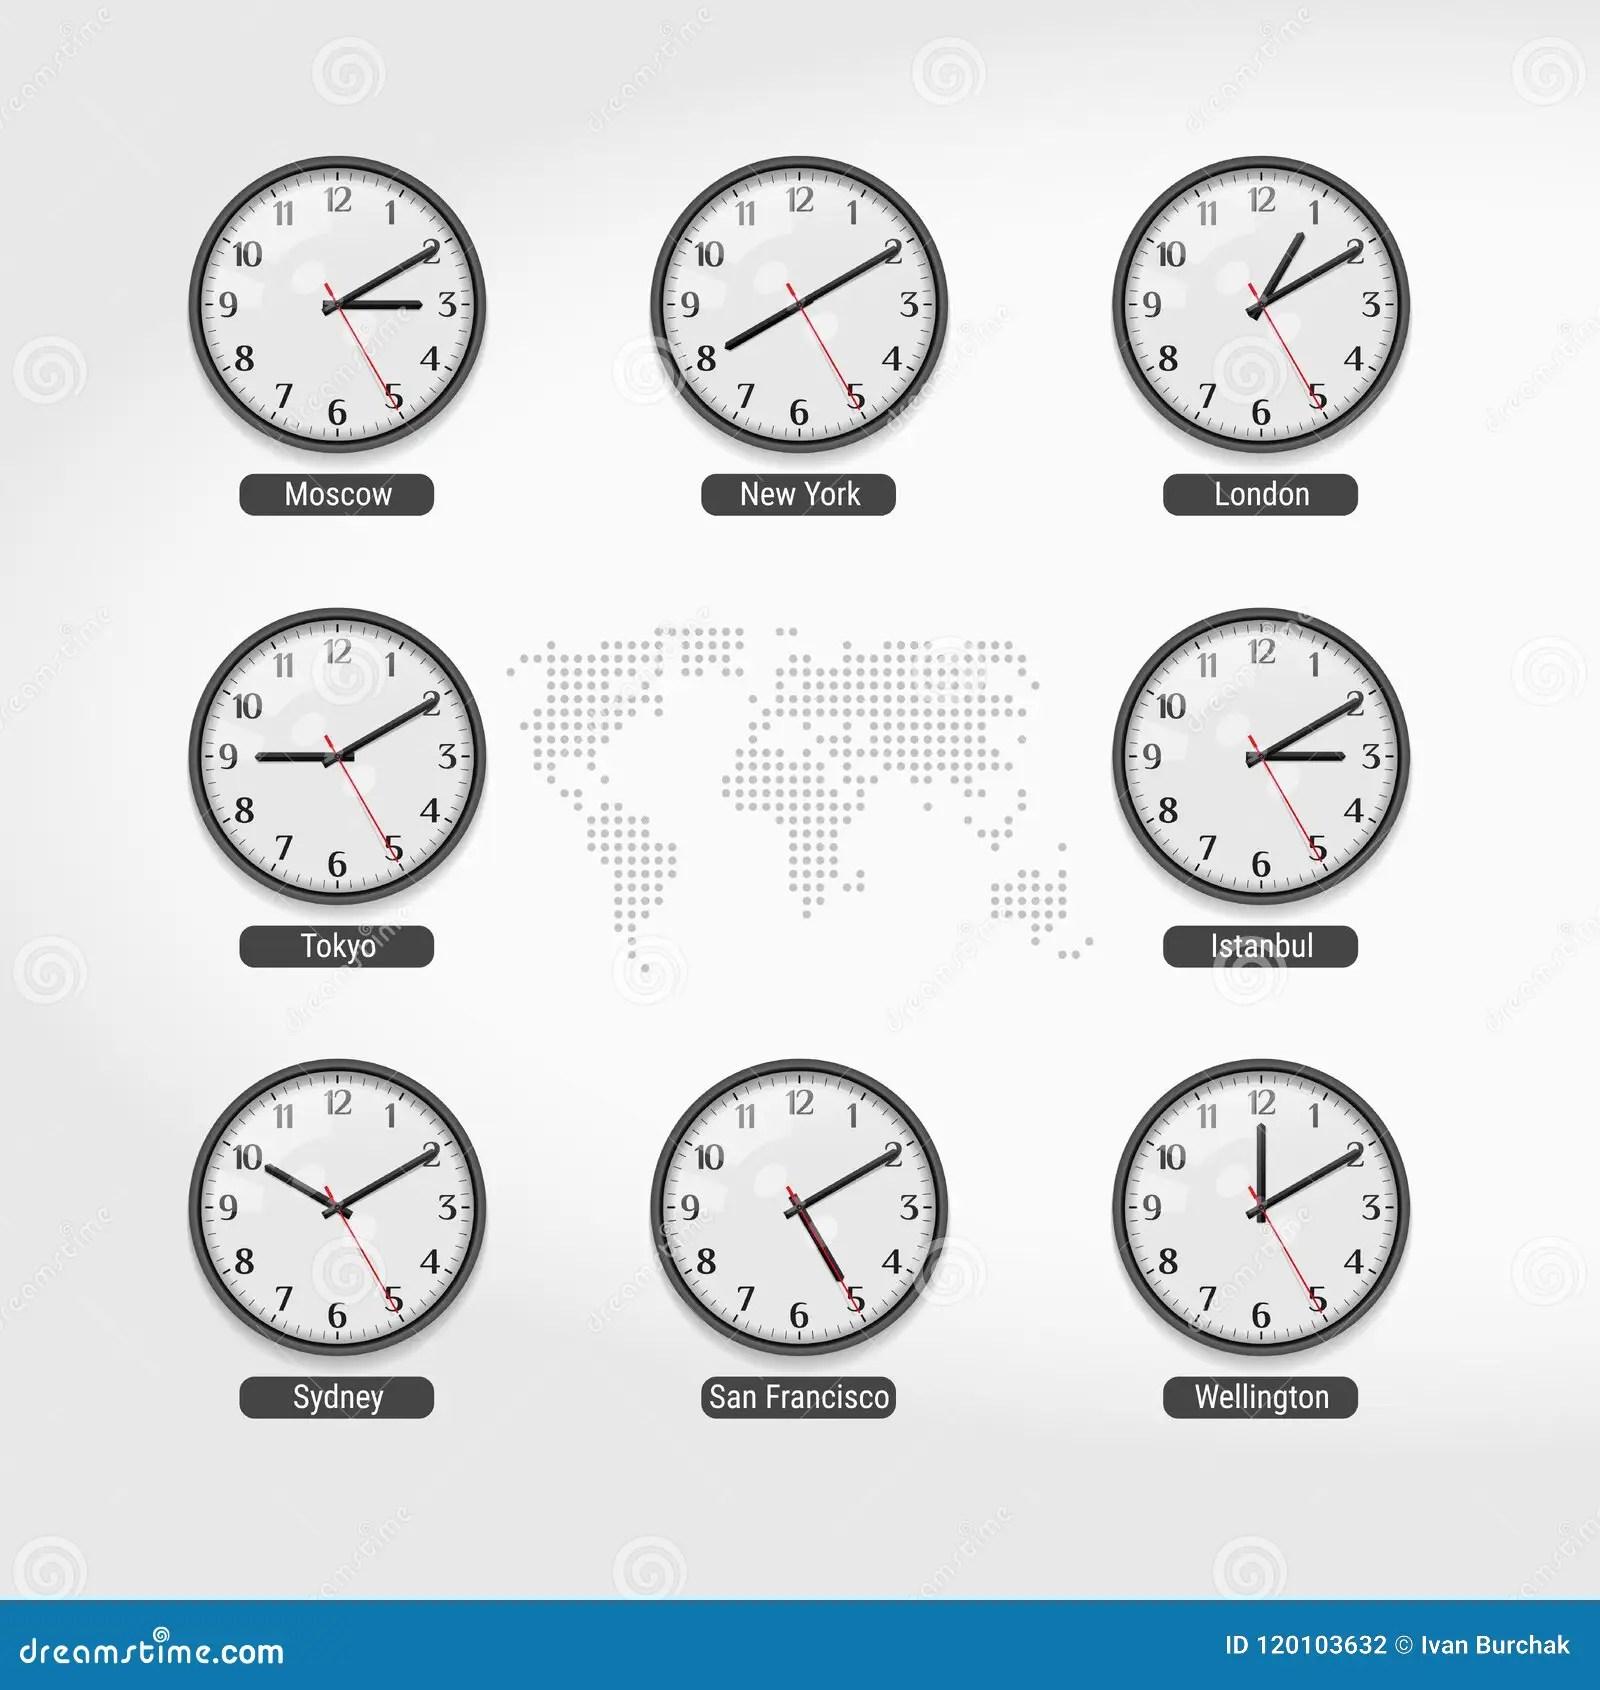 world time clocks current